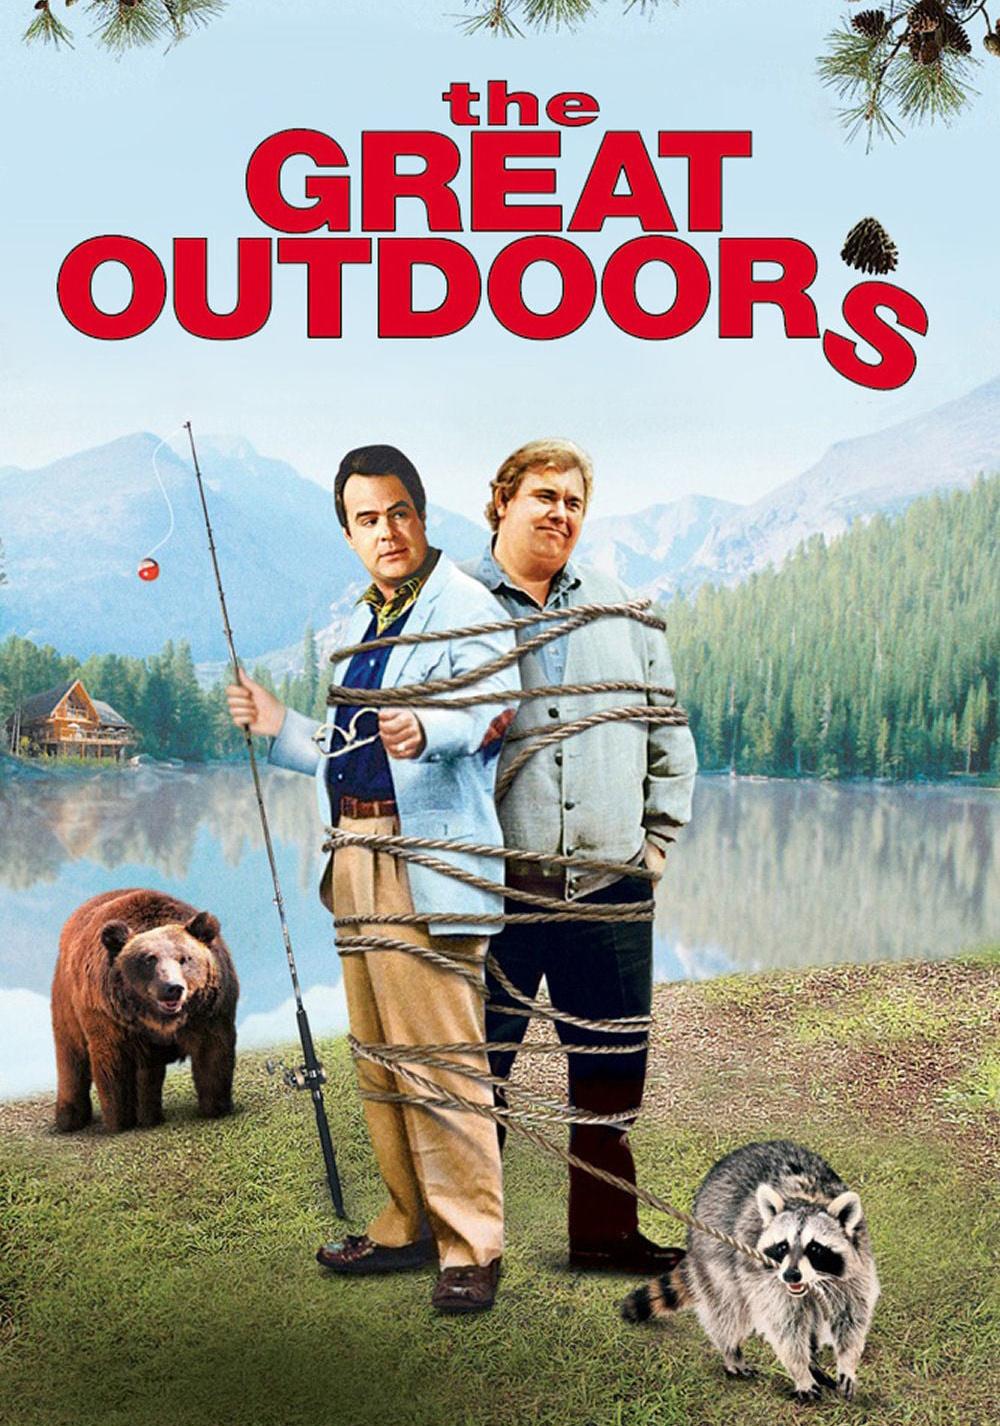 The Great Outdoors | Movie fanart | fanart.tv